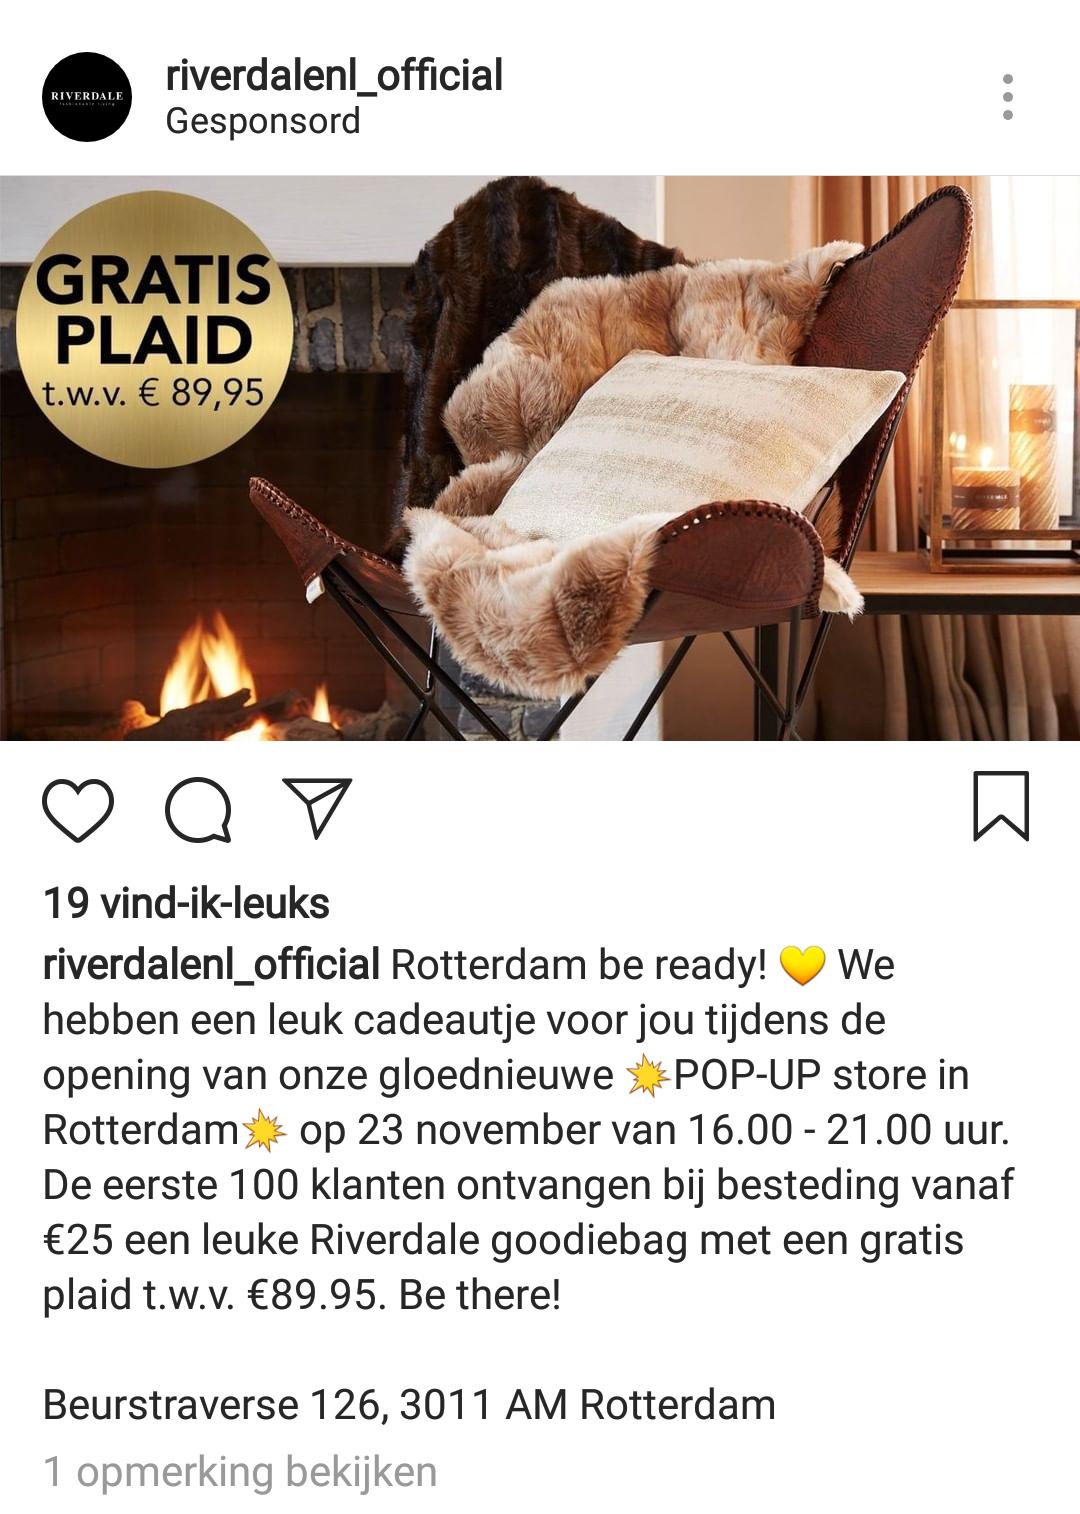 Gratis plaid t.w.v. €89.95 op black friday pop-up store van Riverdale in Rotterdam